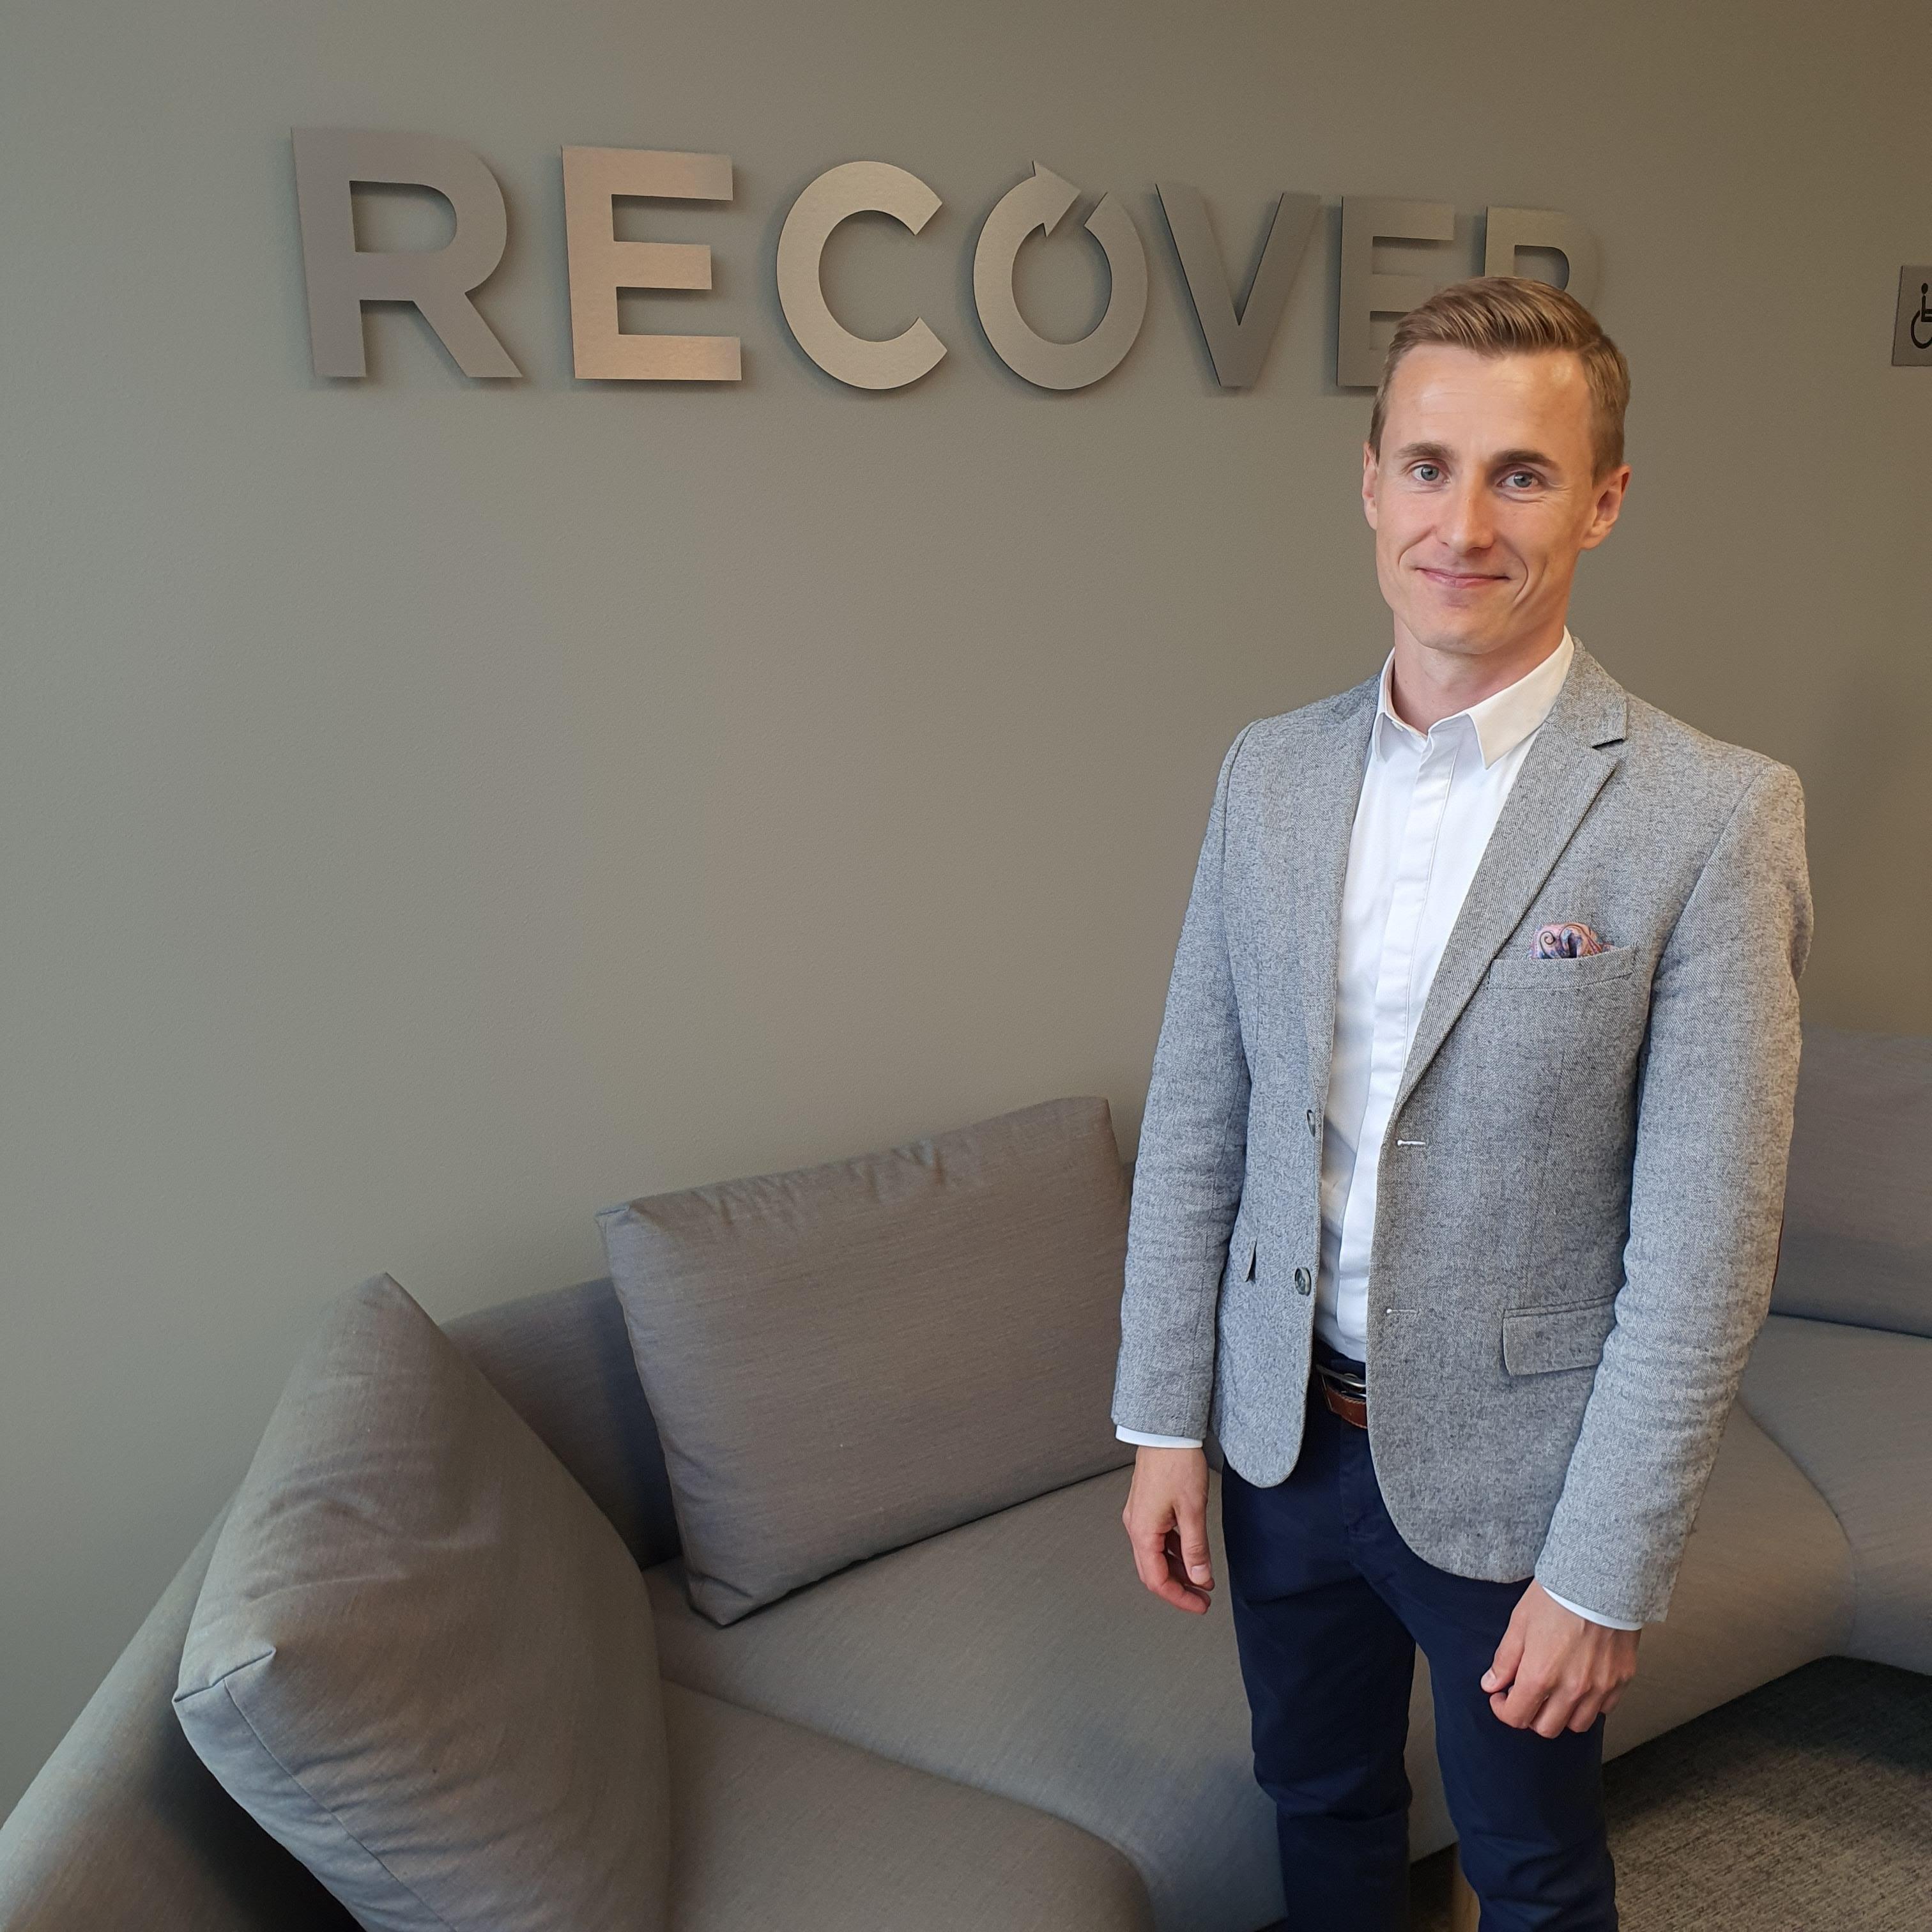 Recover Nordic Korjausrakentaminen Oy